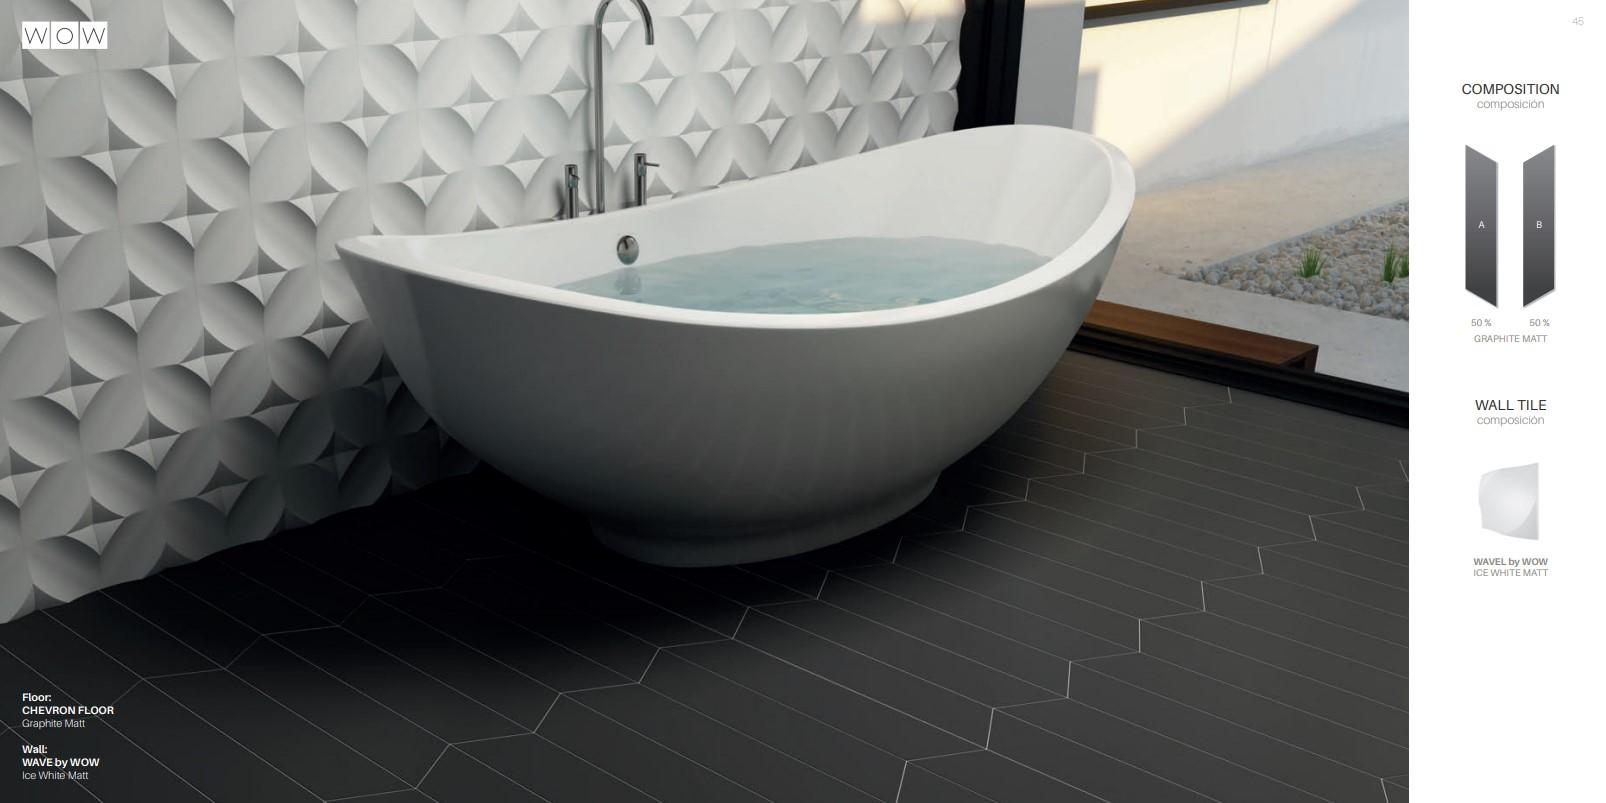 Floor Tiles Graphite Chevron Matte and Wavel Matte Ice White Wall